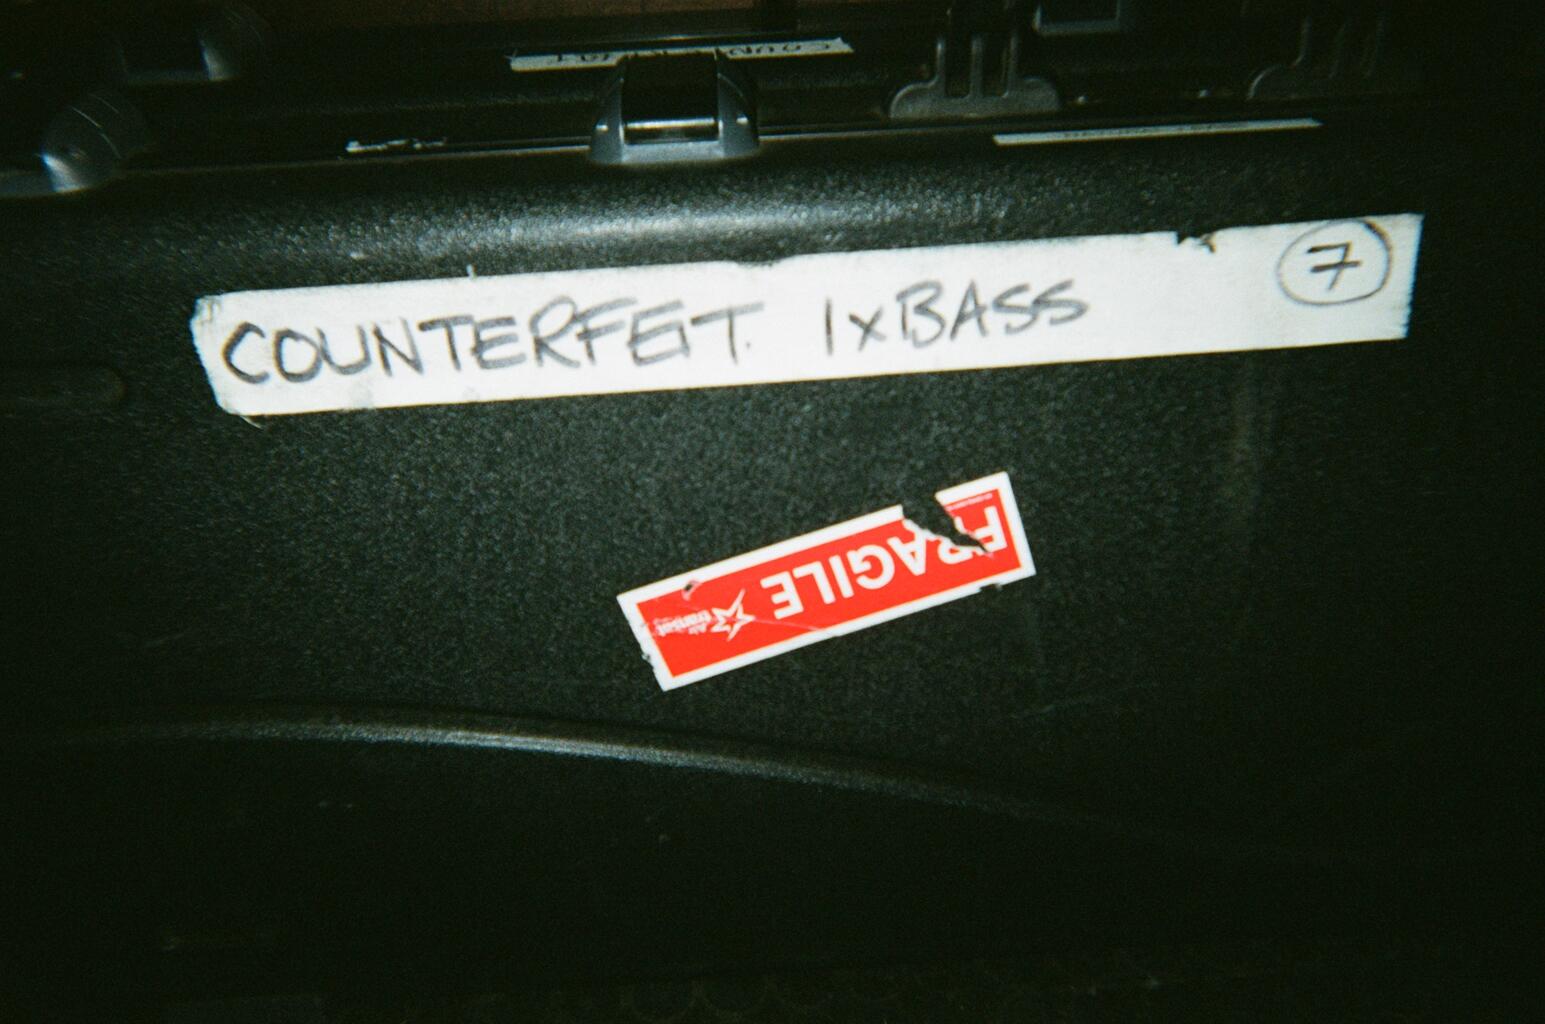 Counterfeit. - GIG GOER 2020